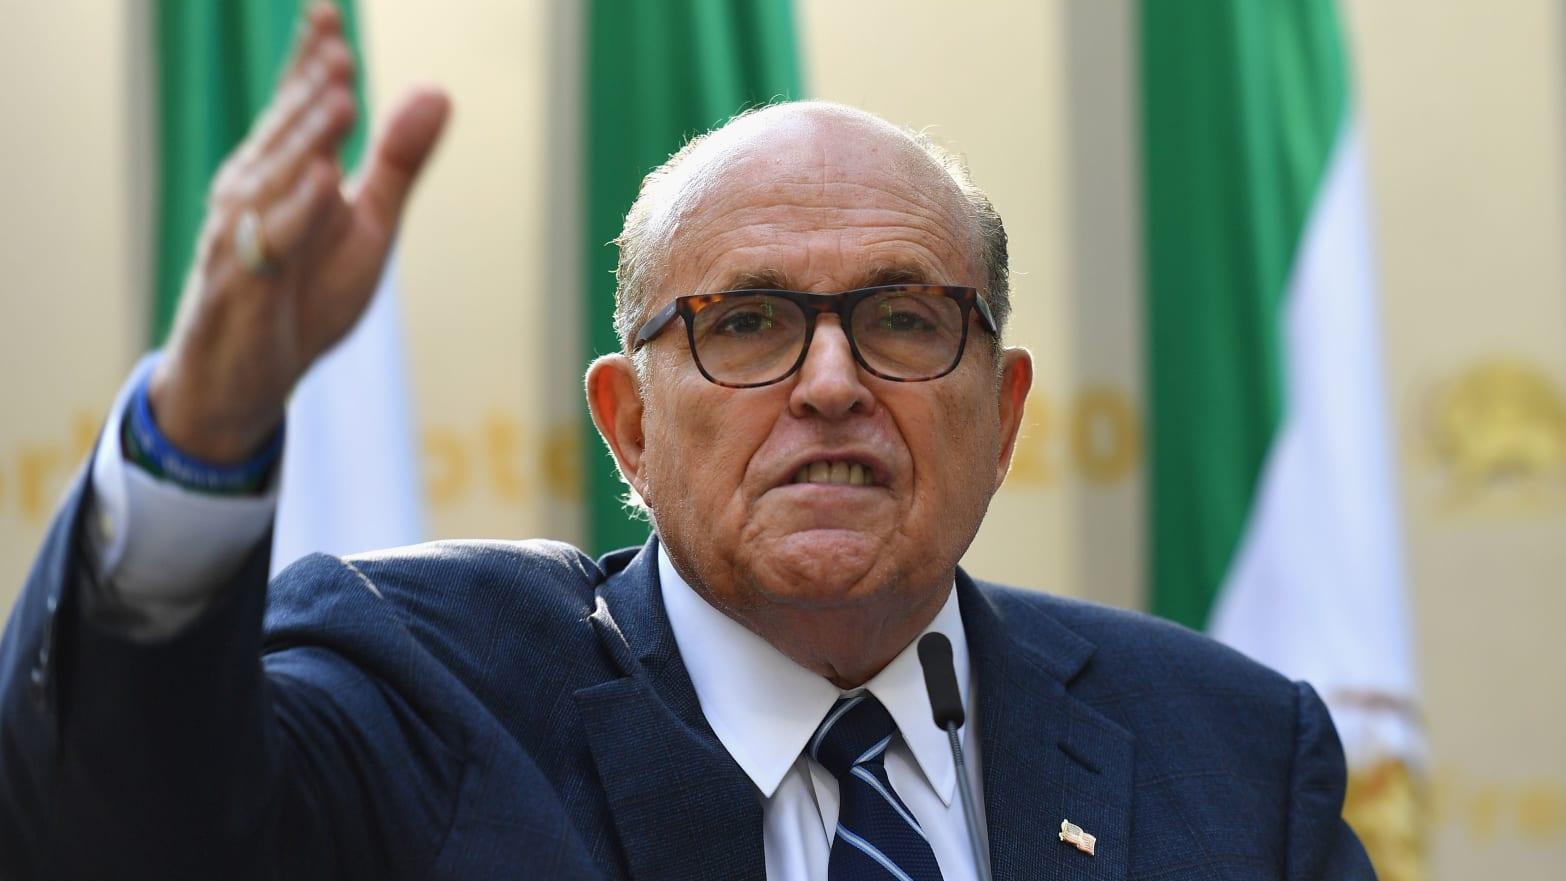 Federal Prosecutors Eyeing Rudy Giuliani's Lobbying Work After Arrest of Ukraine Associates